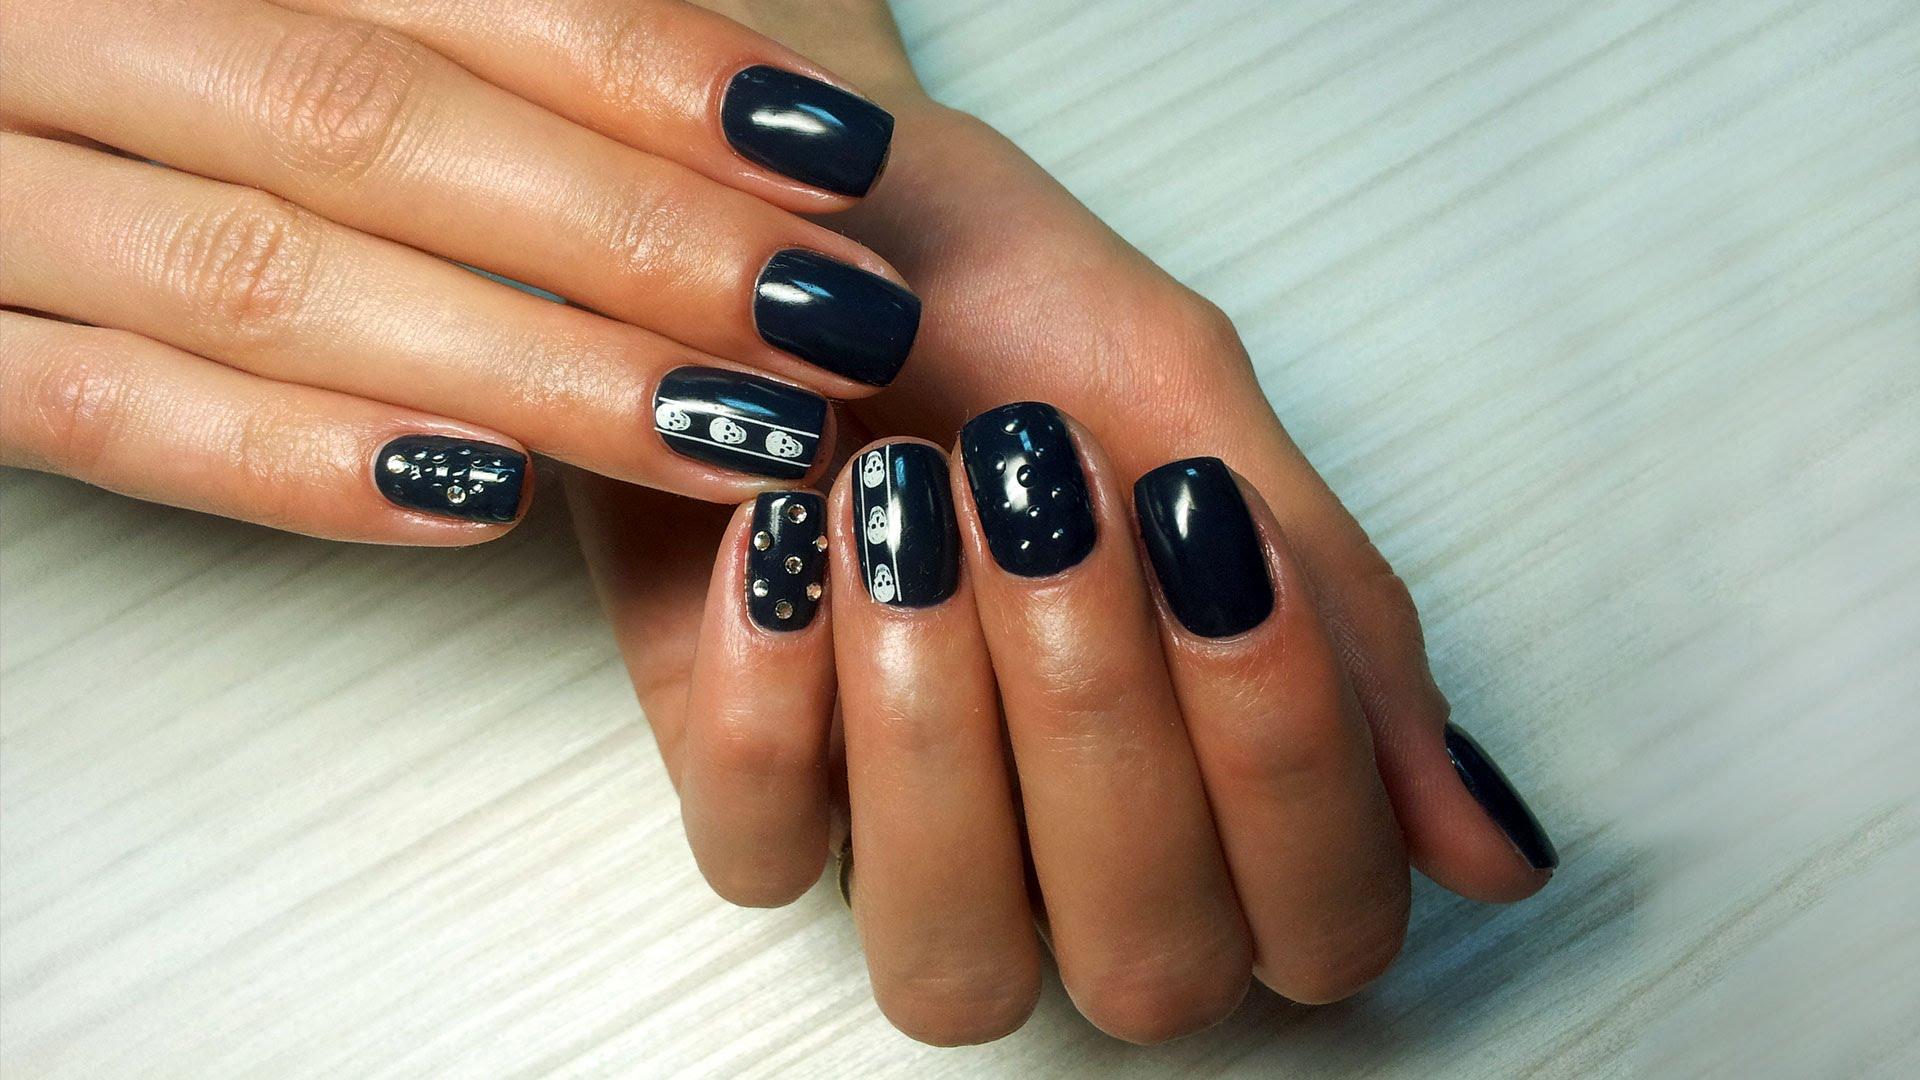 Фото: дизайн ногтей с наклейками-слайдерами.